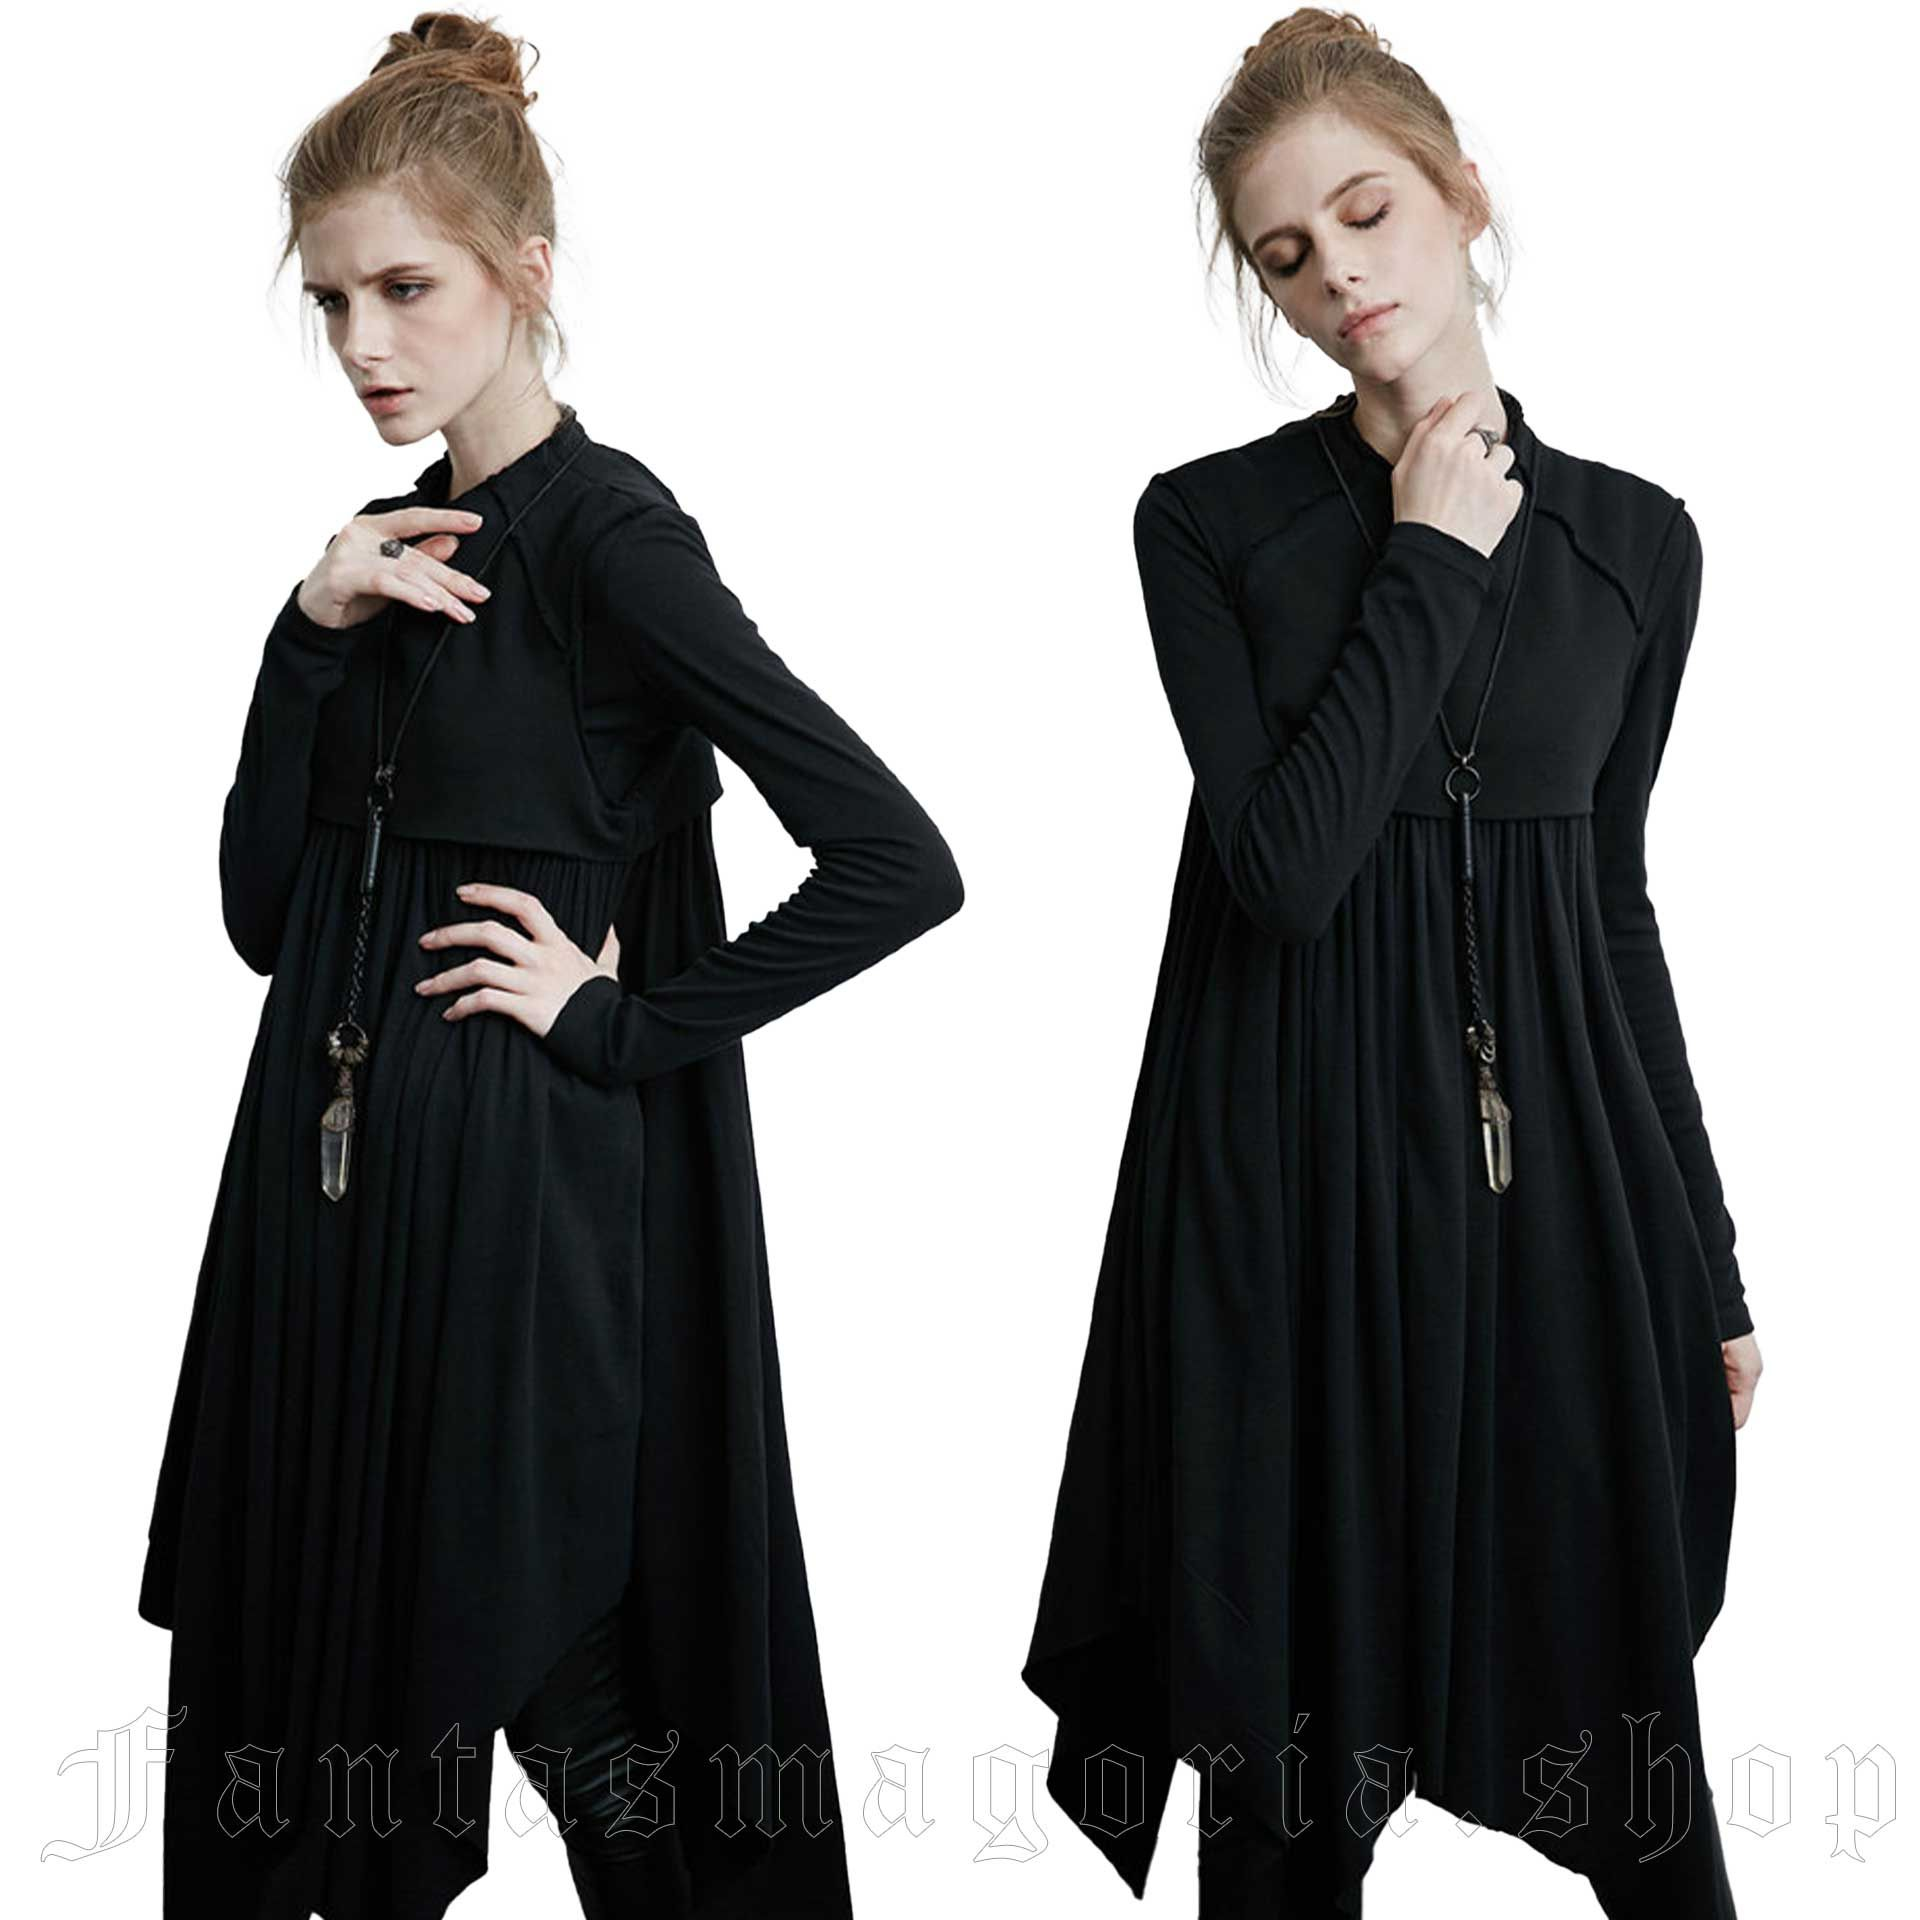 The Outcast Top-dress